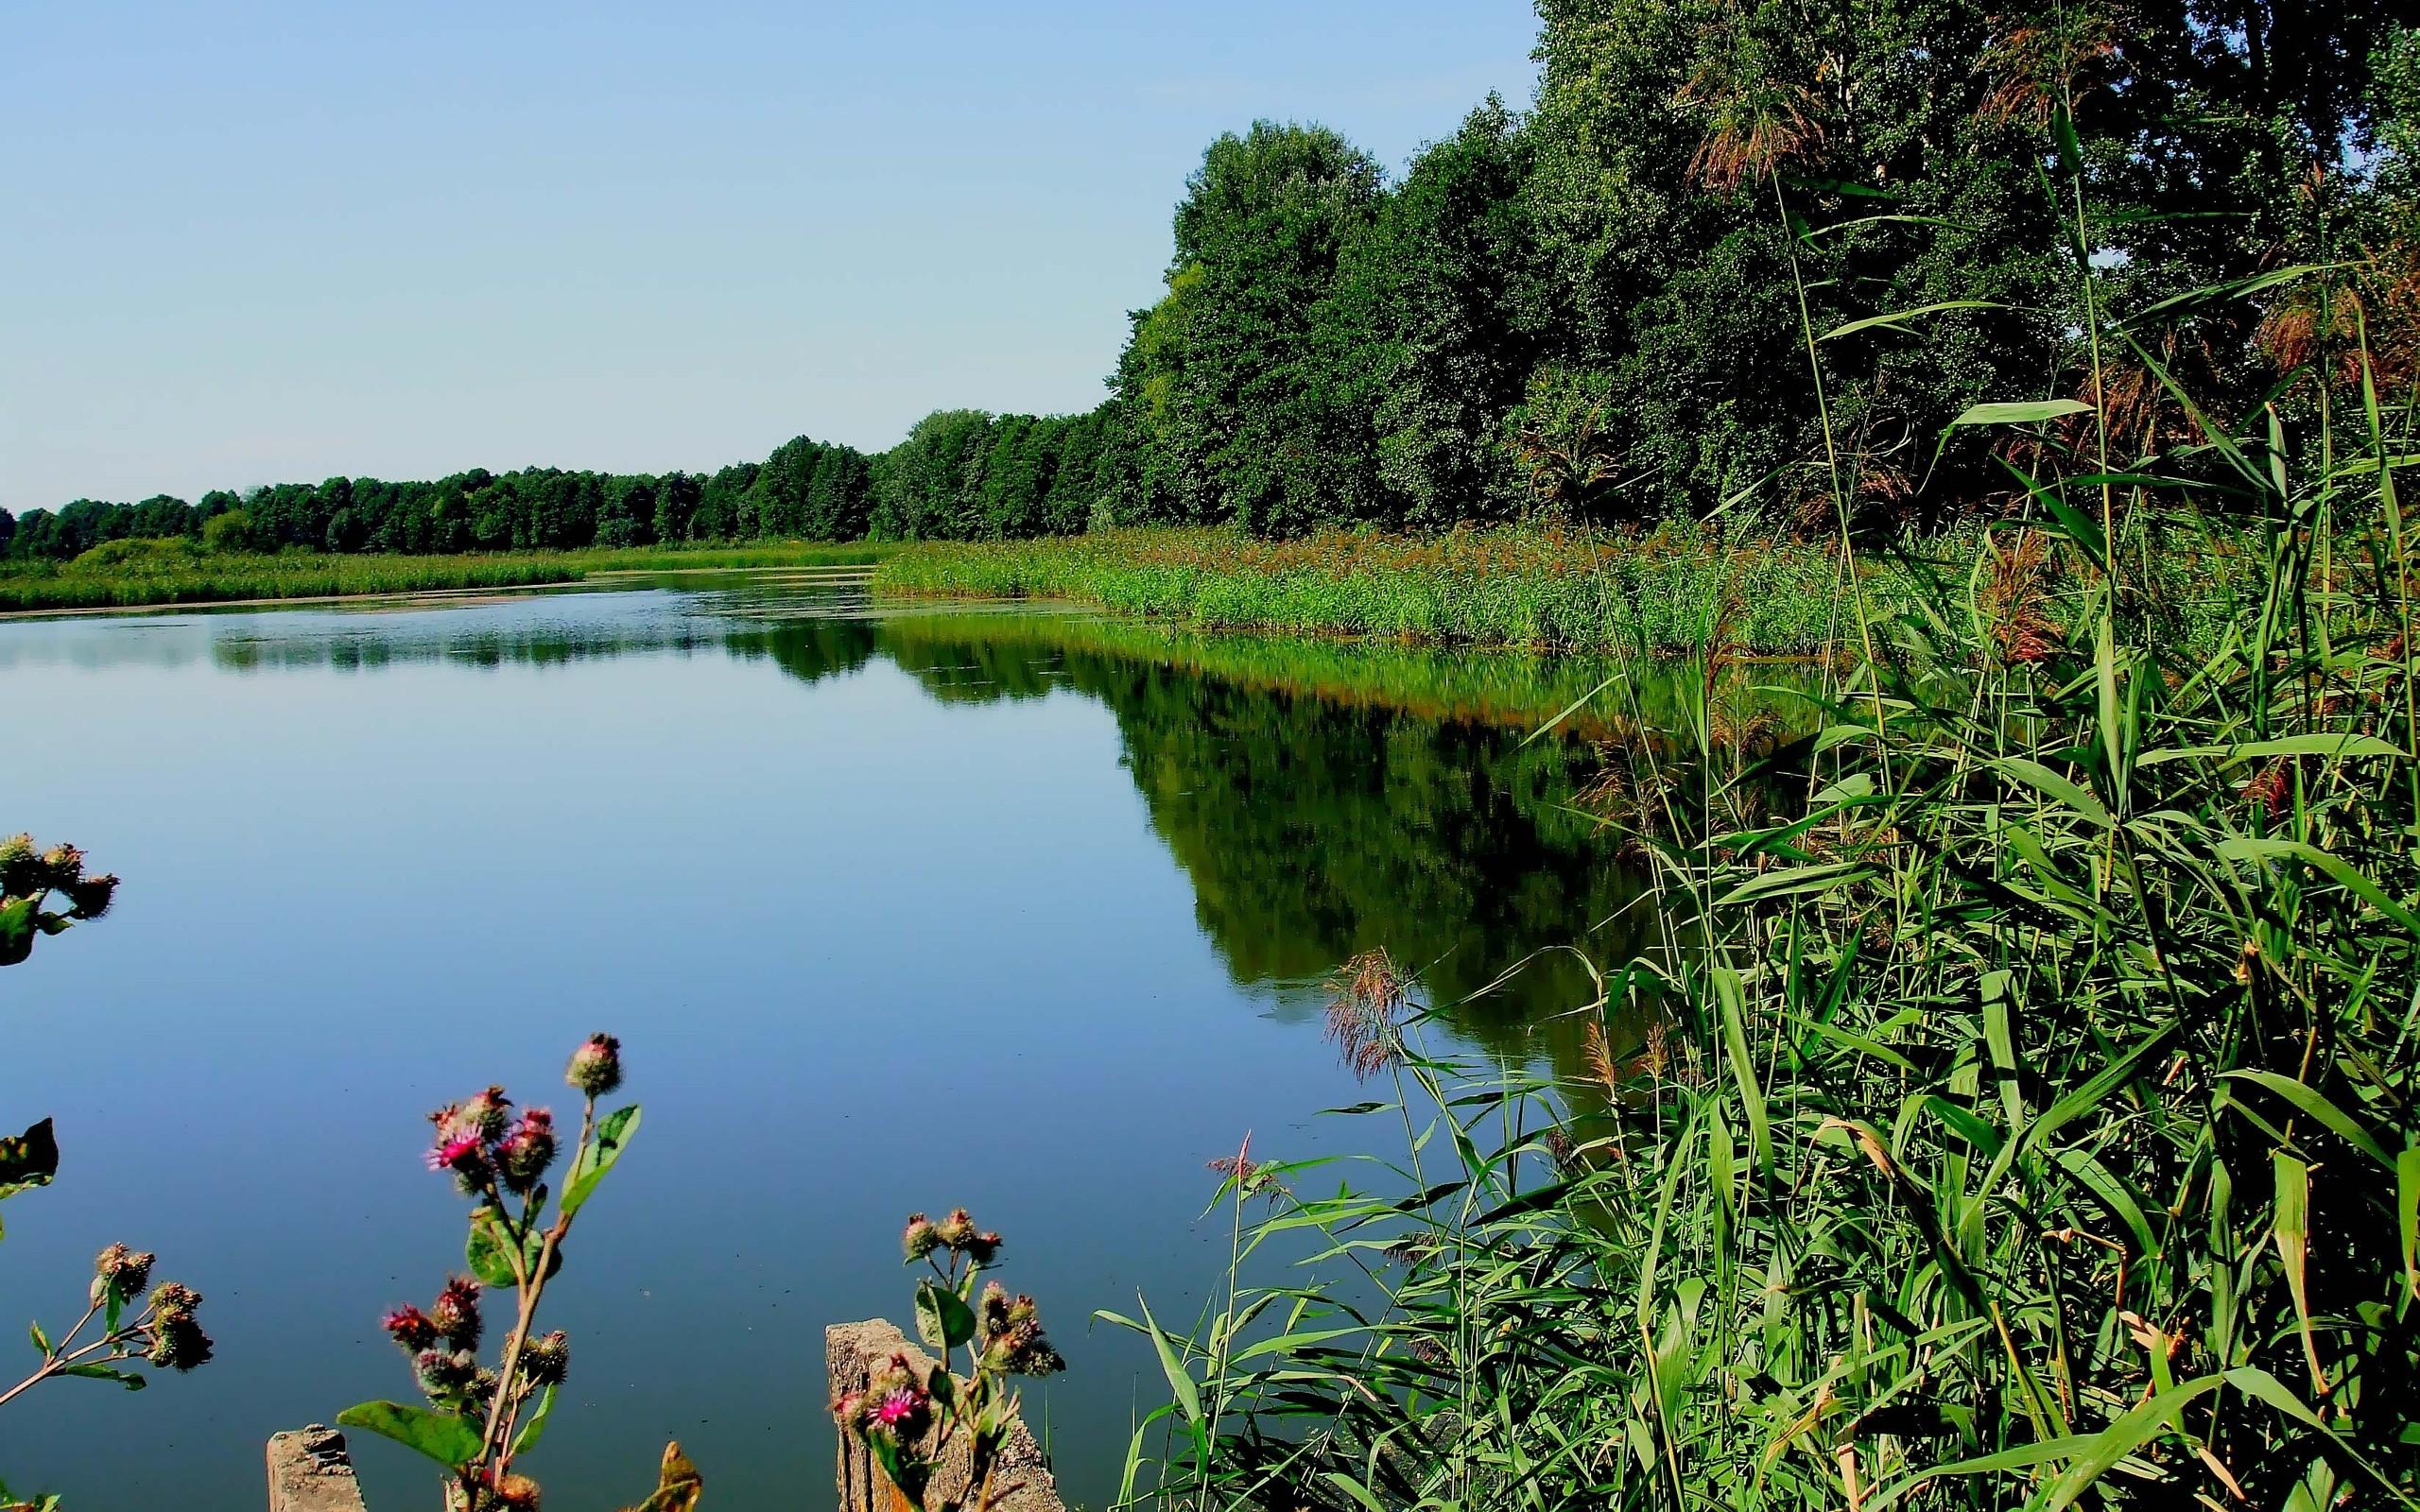 лето речка камыш  № 368815 бесплатно